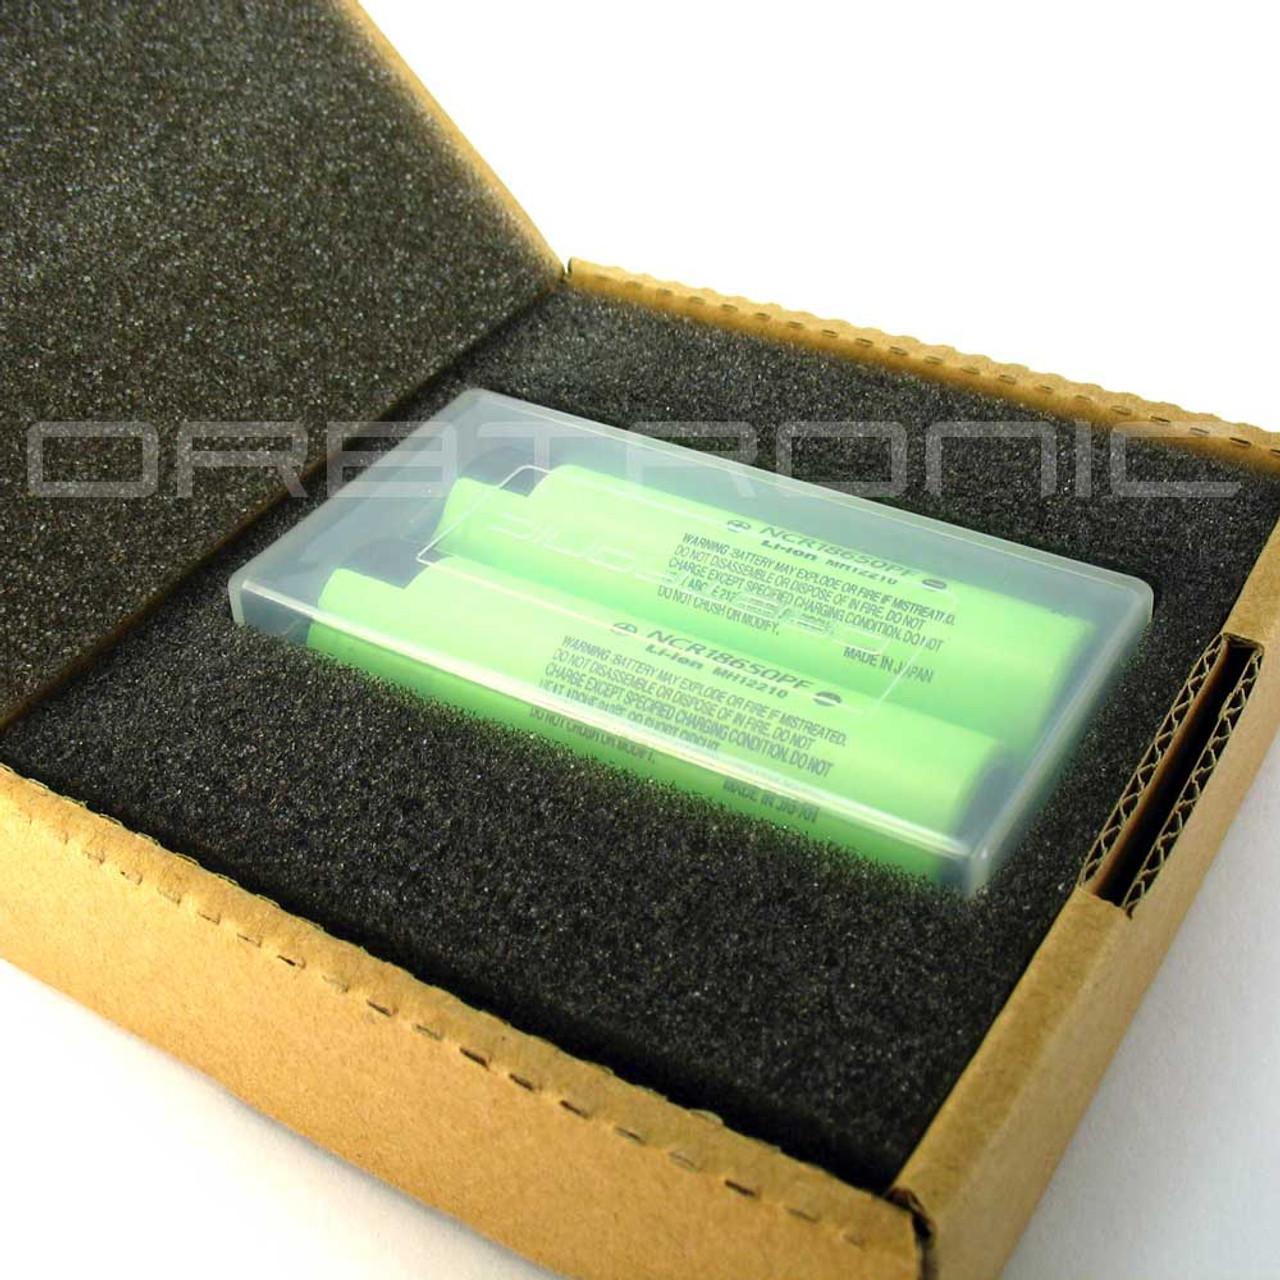 Panasonic NCR18650PF 2900mAh Li-ion Battery Flat-Top Unprotected 10A Cell